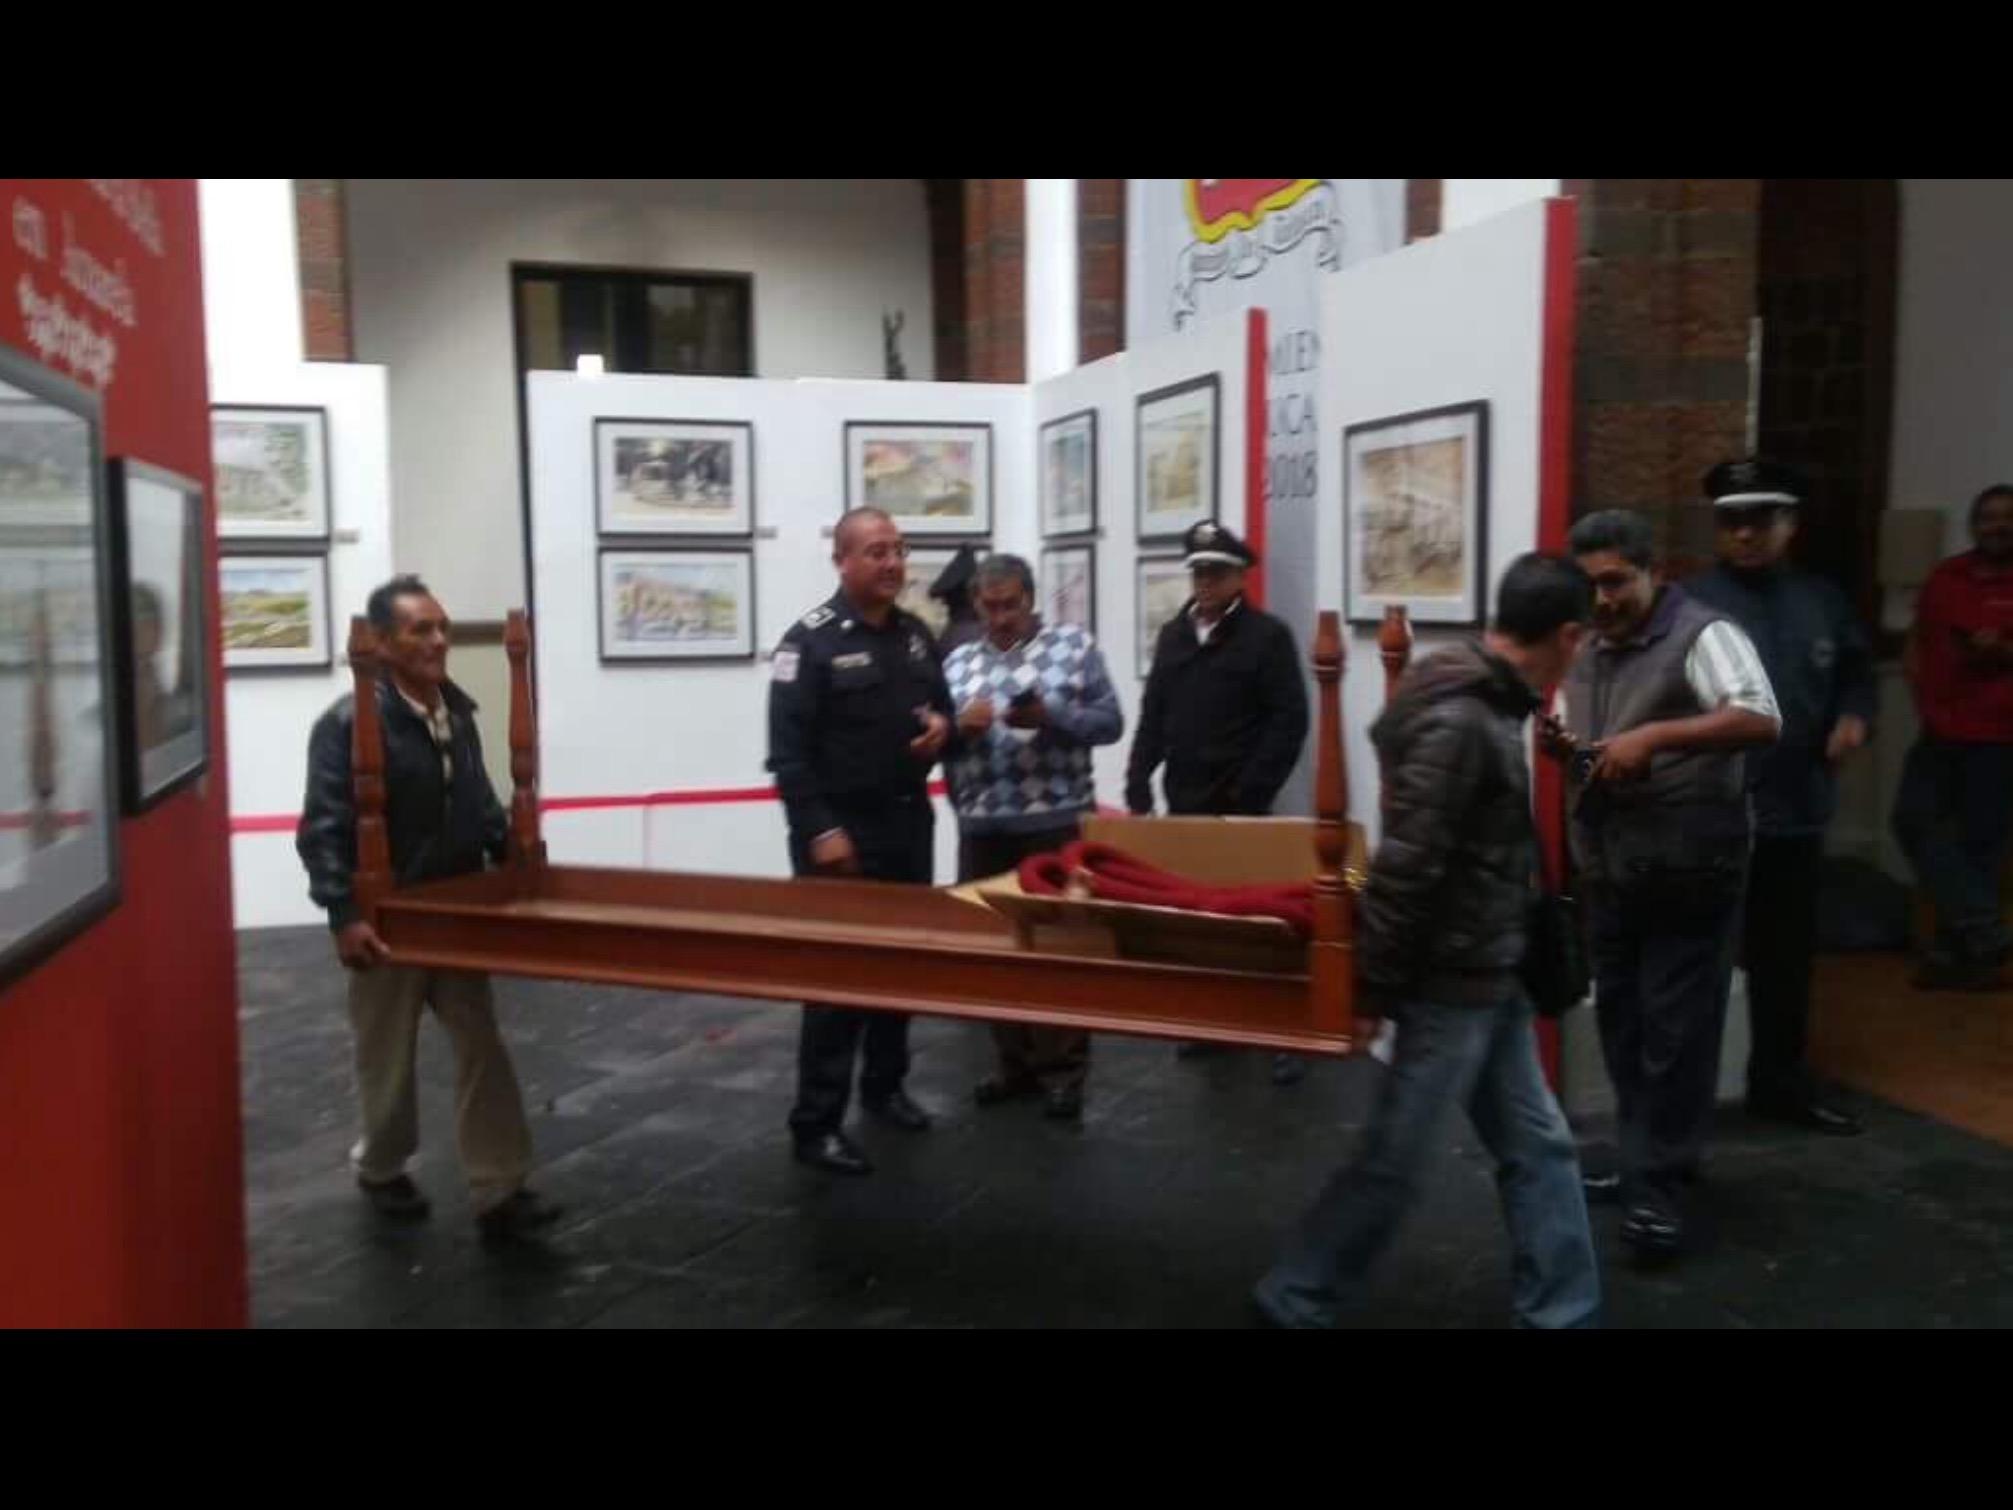 Esconde Toluca mobiliario para evitar embargo